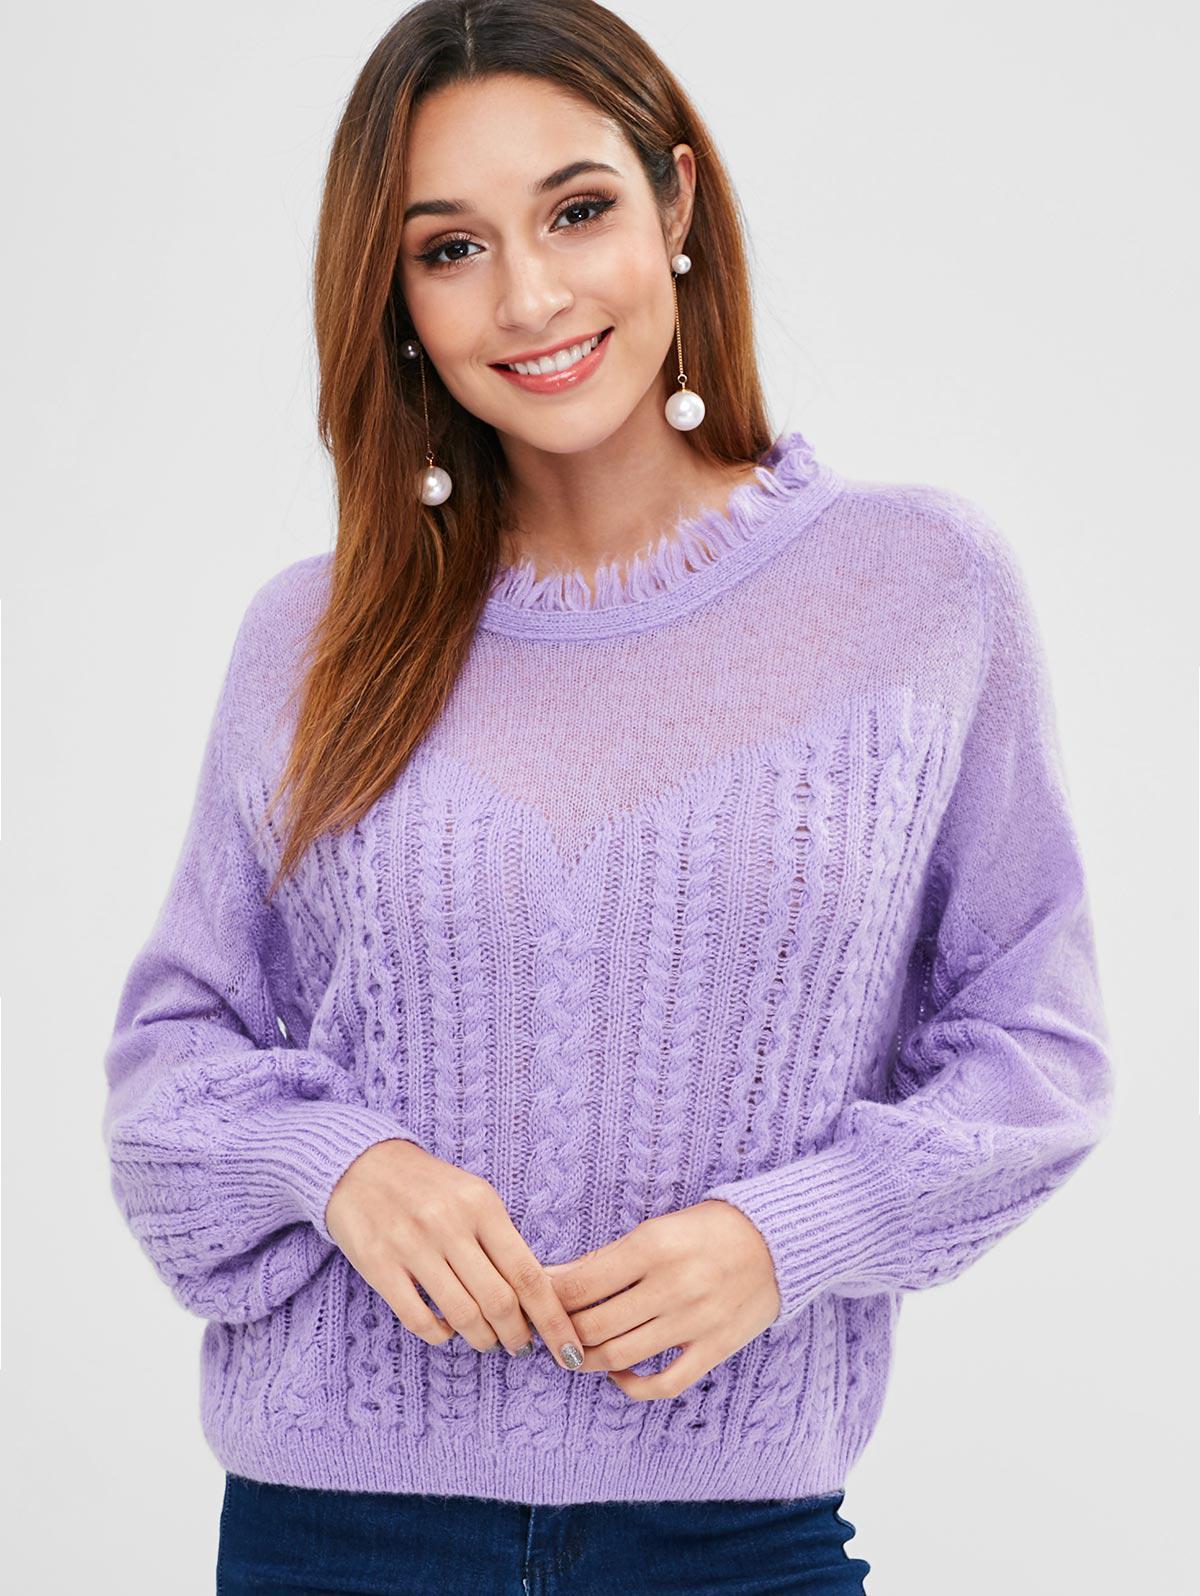 ZAFUL Frayed Cable Knit Sweater